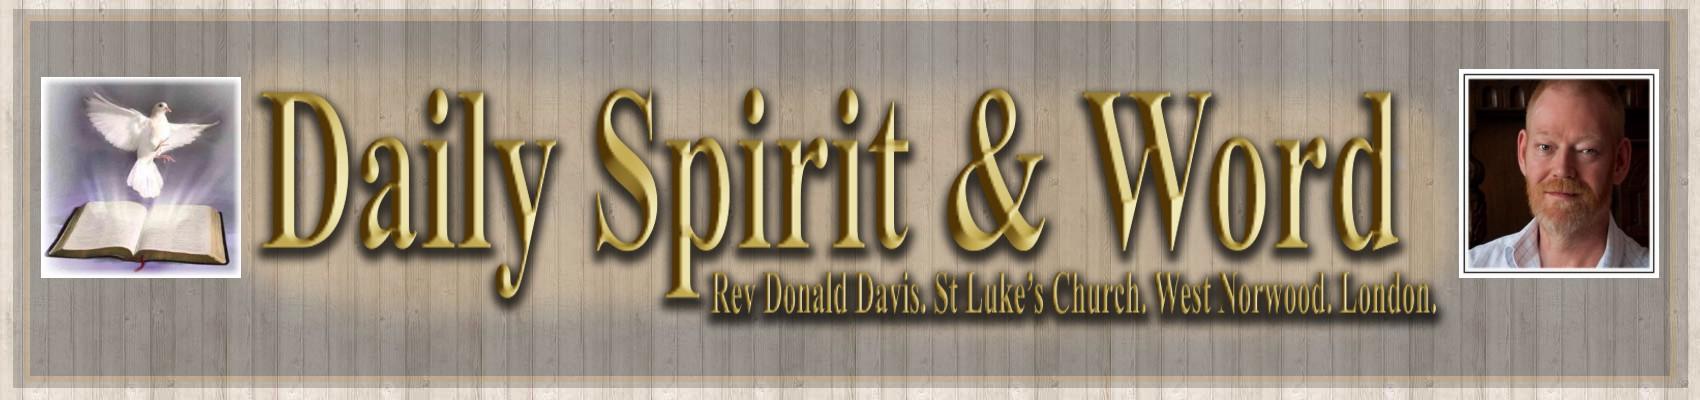 Daily Spirit & Word